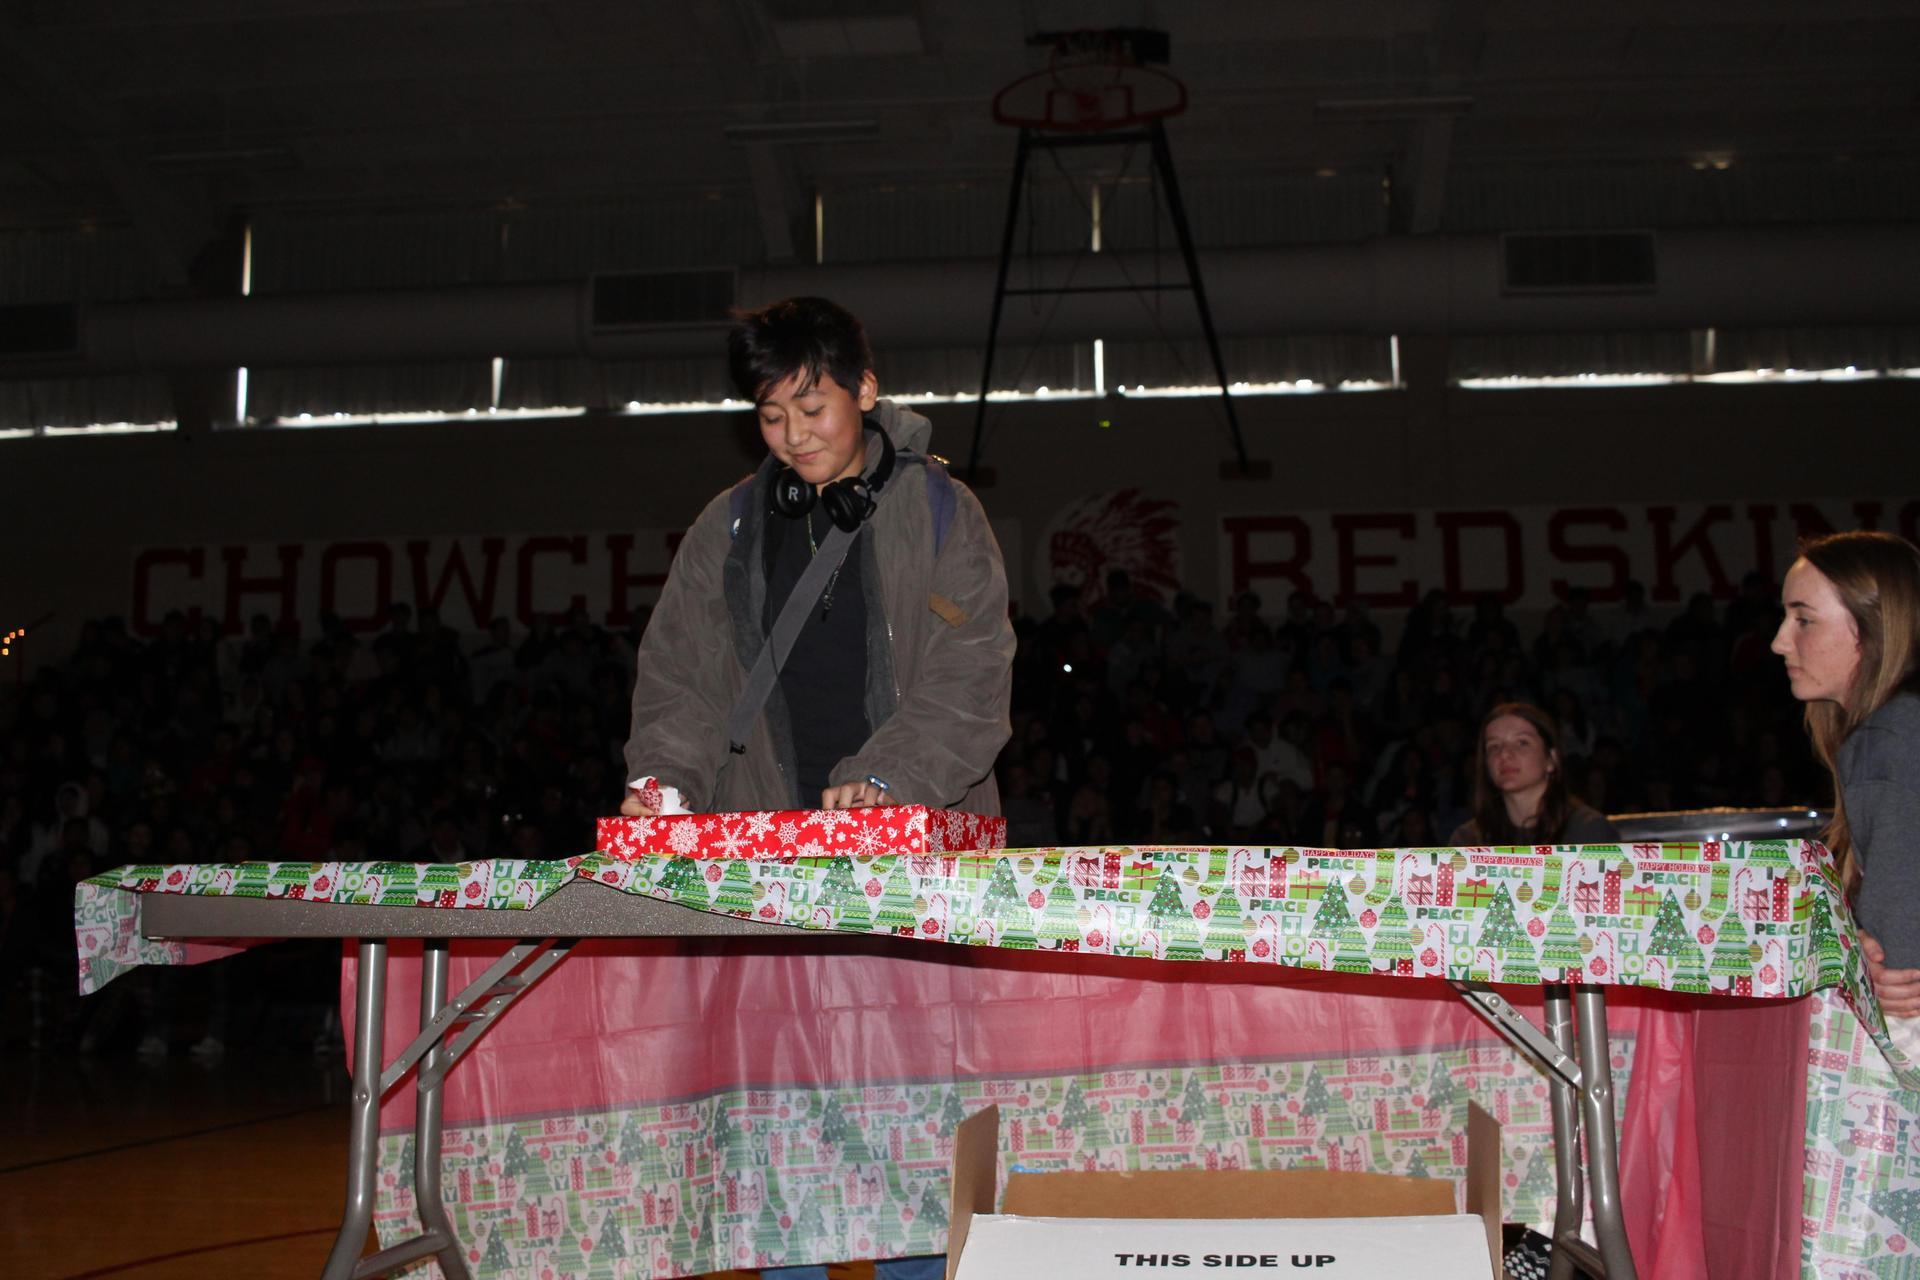 Nicolas Gonzales  opening his gift